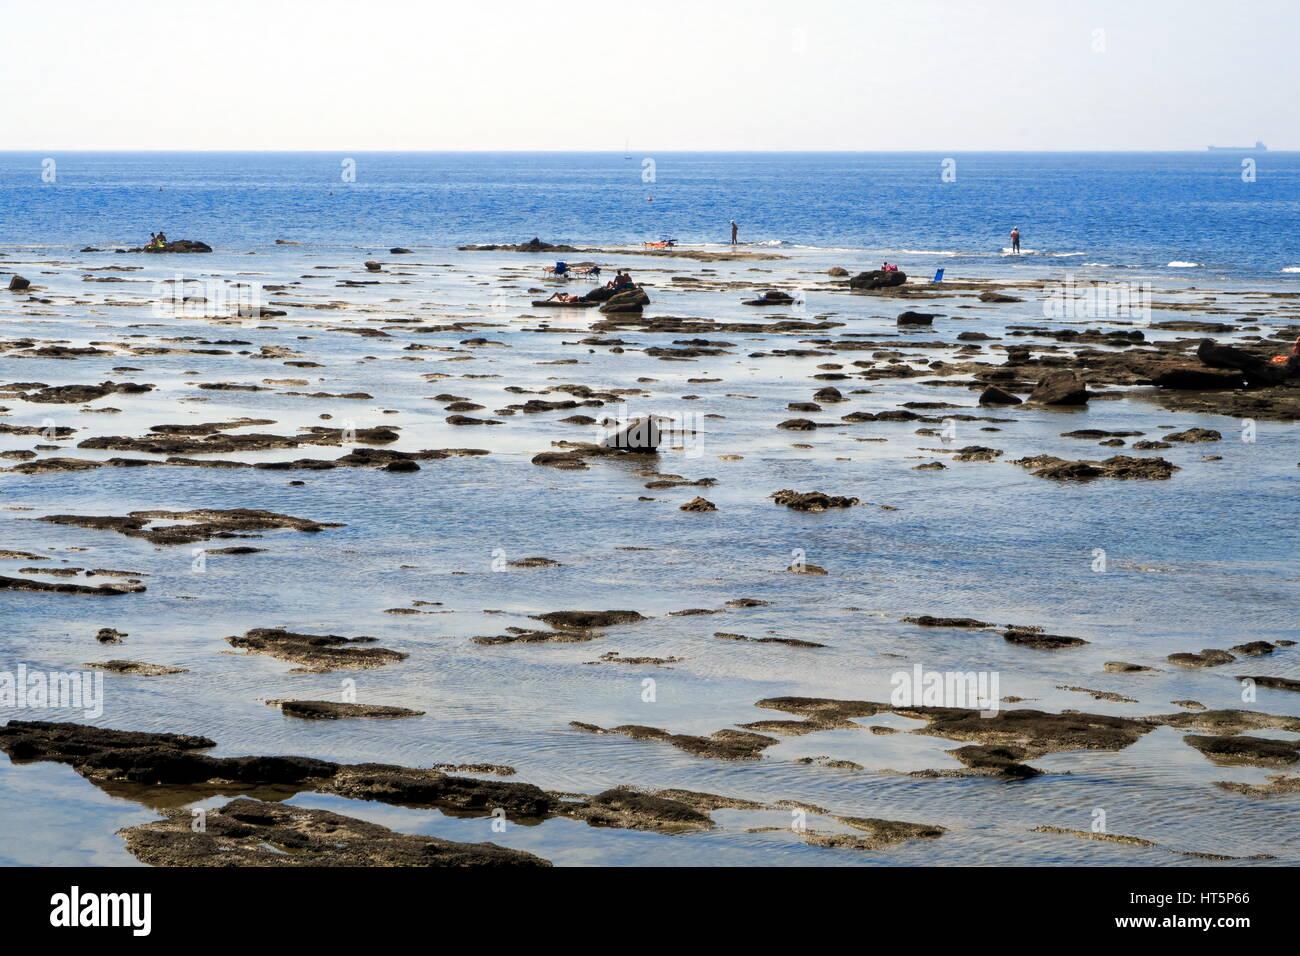 Livorno Italy Beach Stock Photos  Livorno Italy Beach Stock Images  Alamy